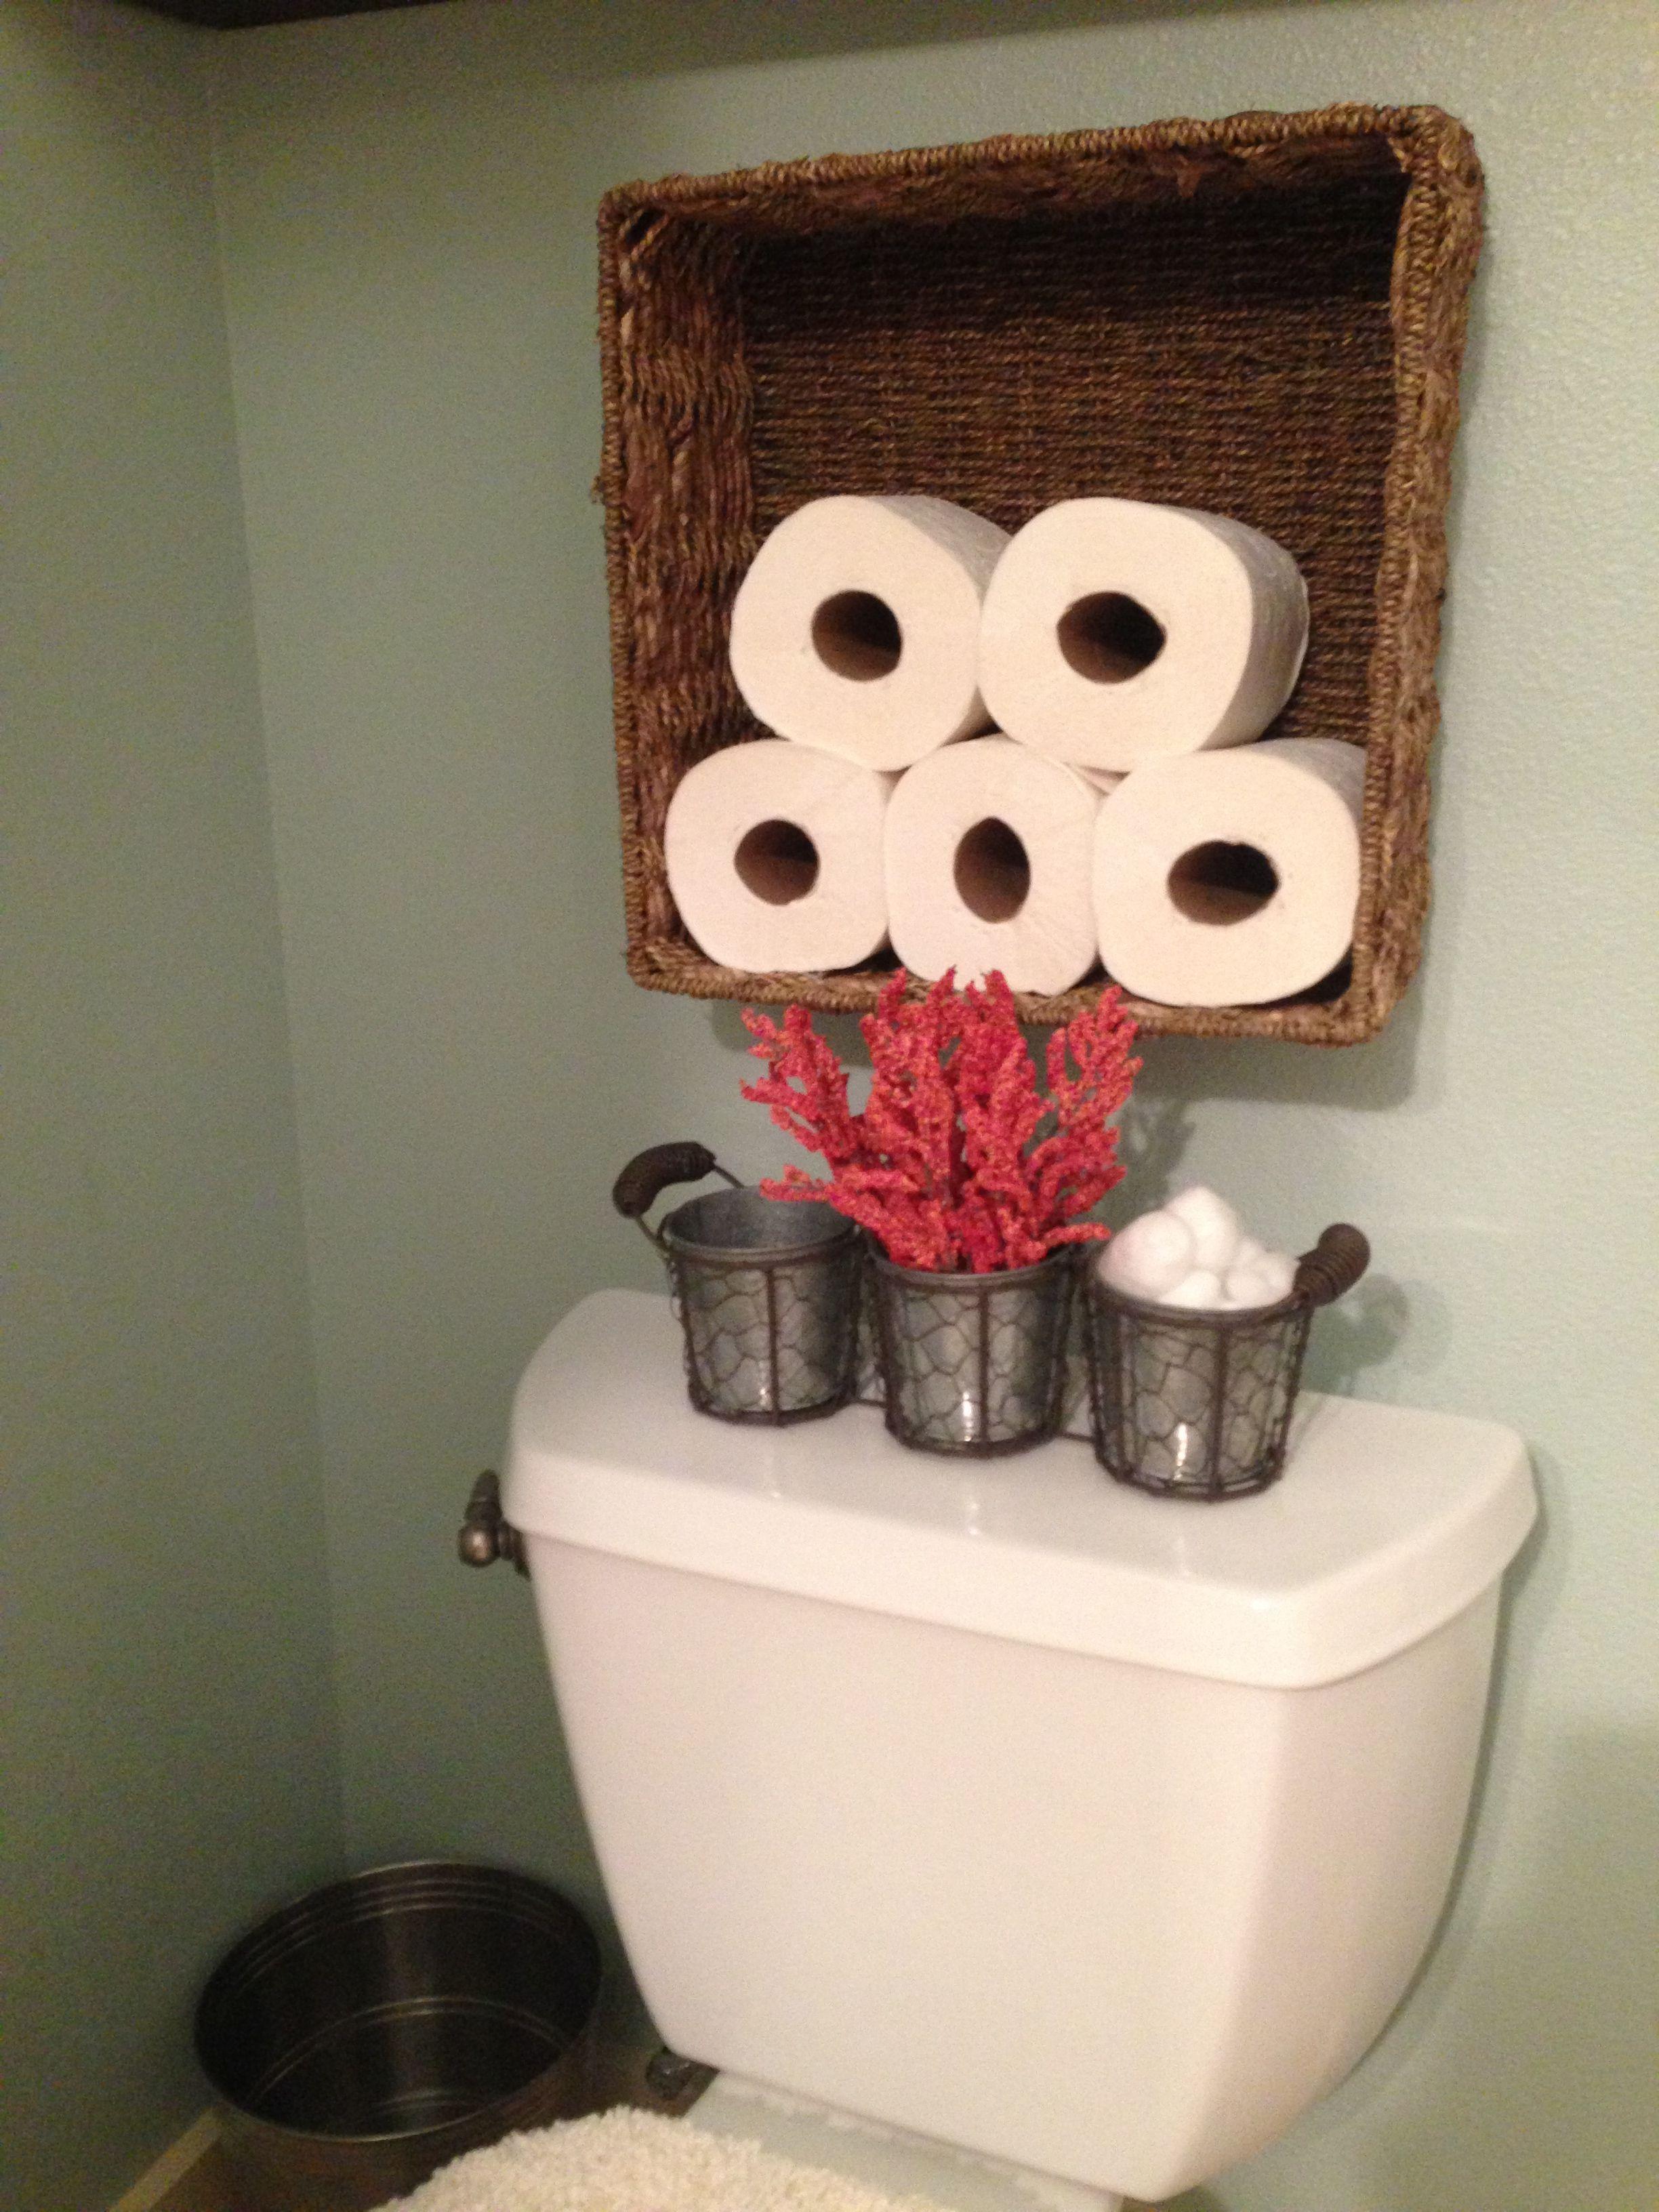 Toilet Roll Holder For Small Bathroom